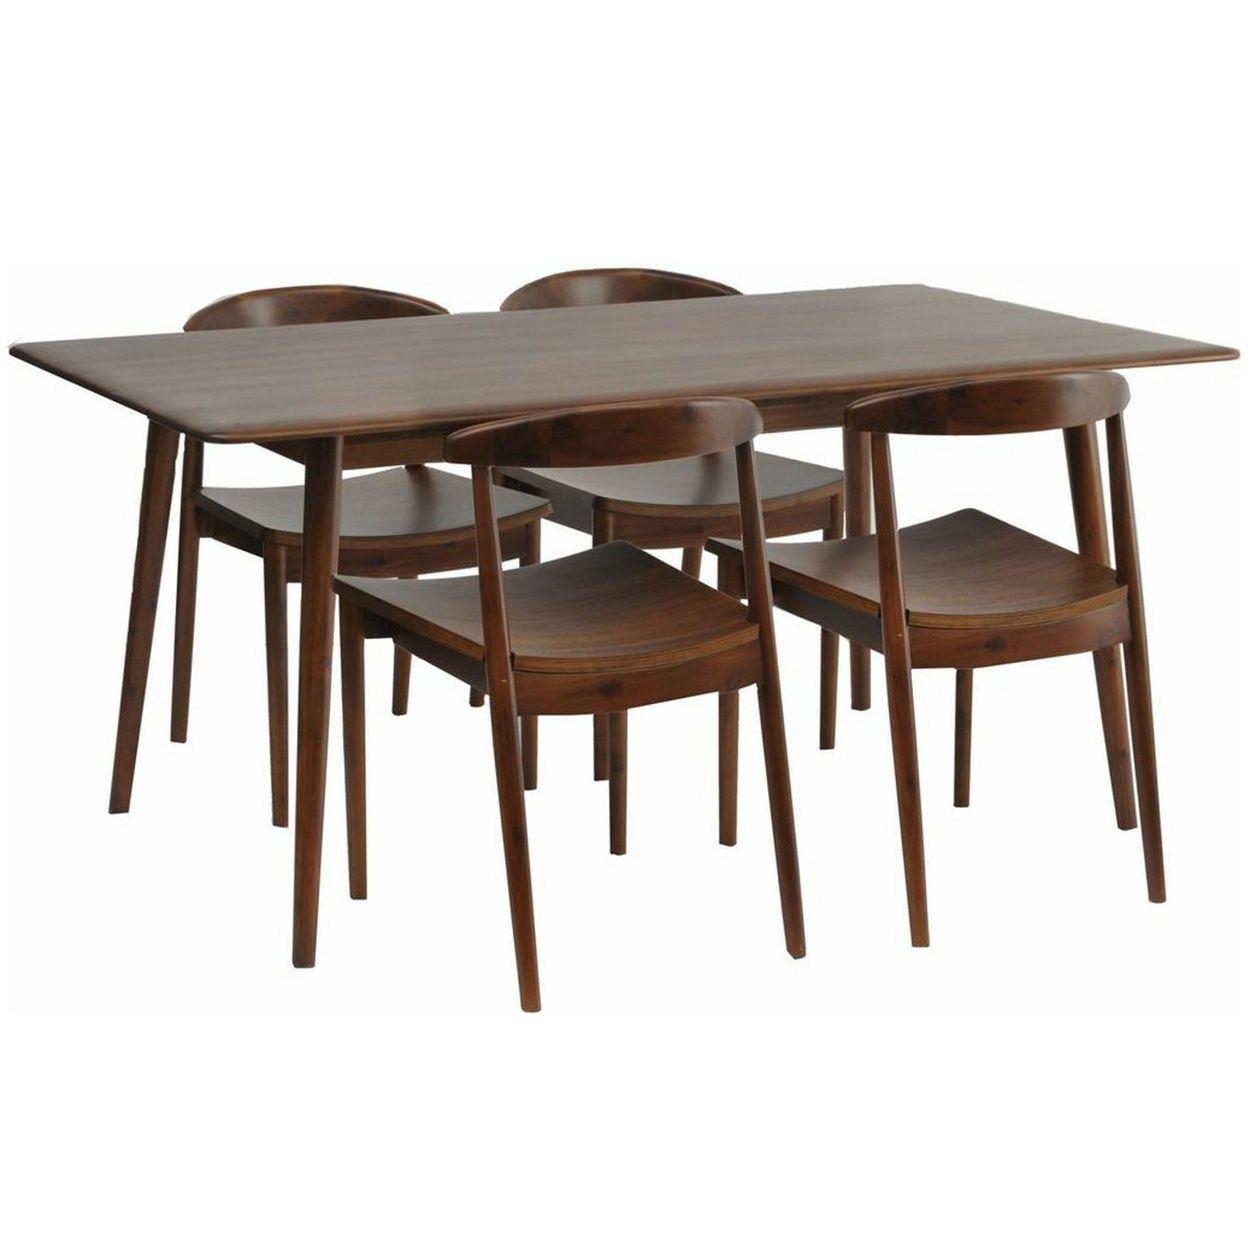 Debenhams acacia wood estelle table and 4 chairs set at debenhams acacia wood estelle table and 4 chairs set at debenhams geotapseo Images